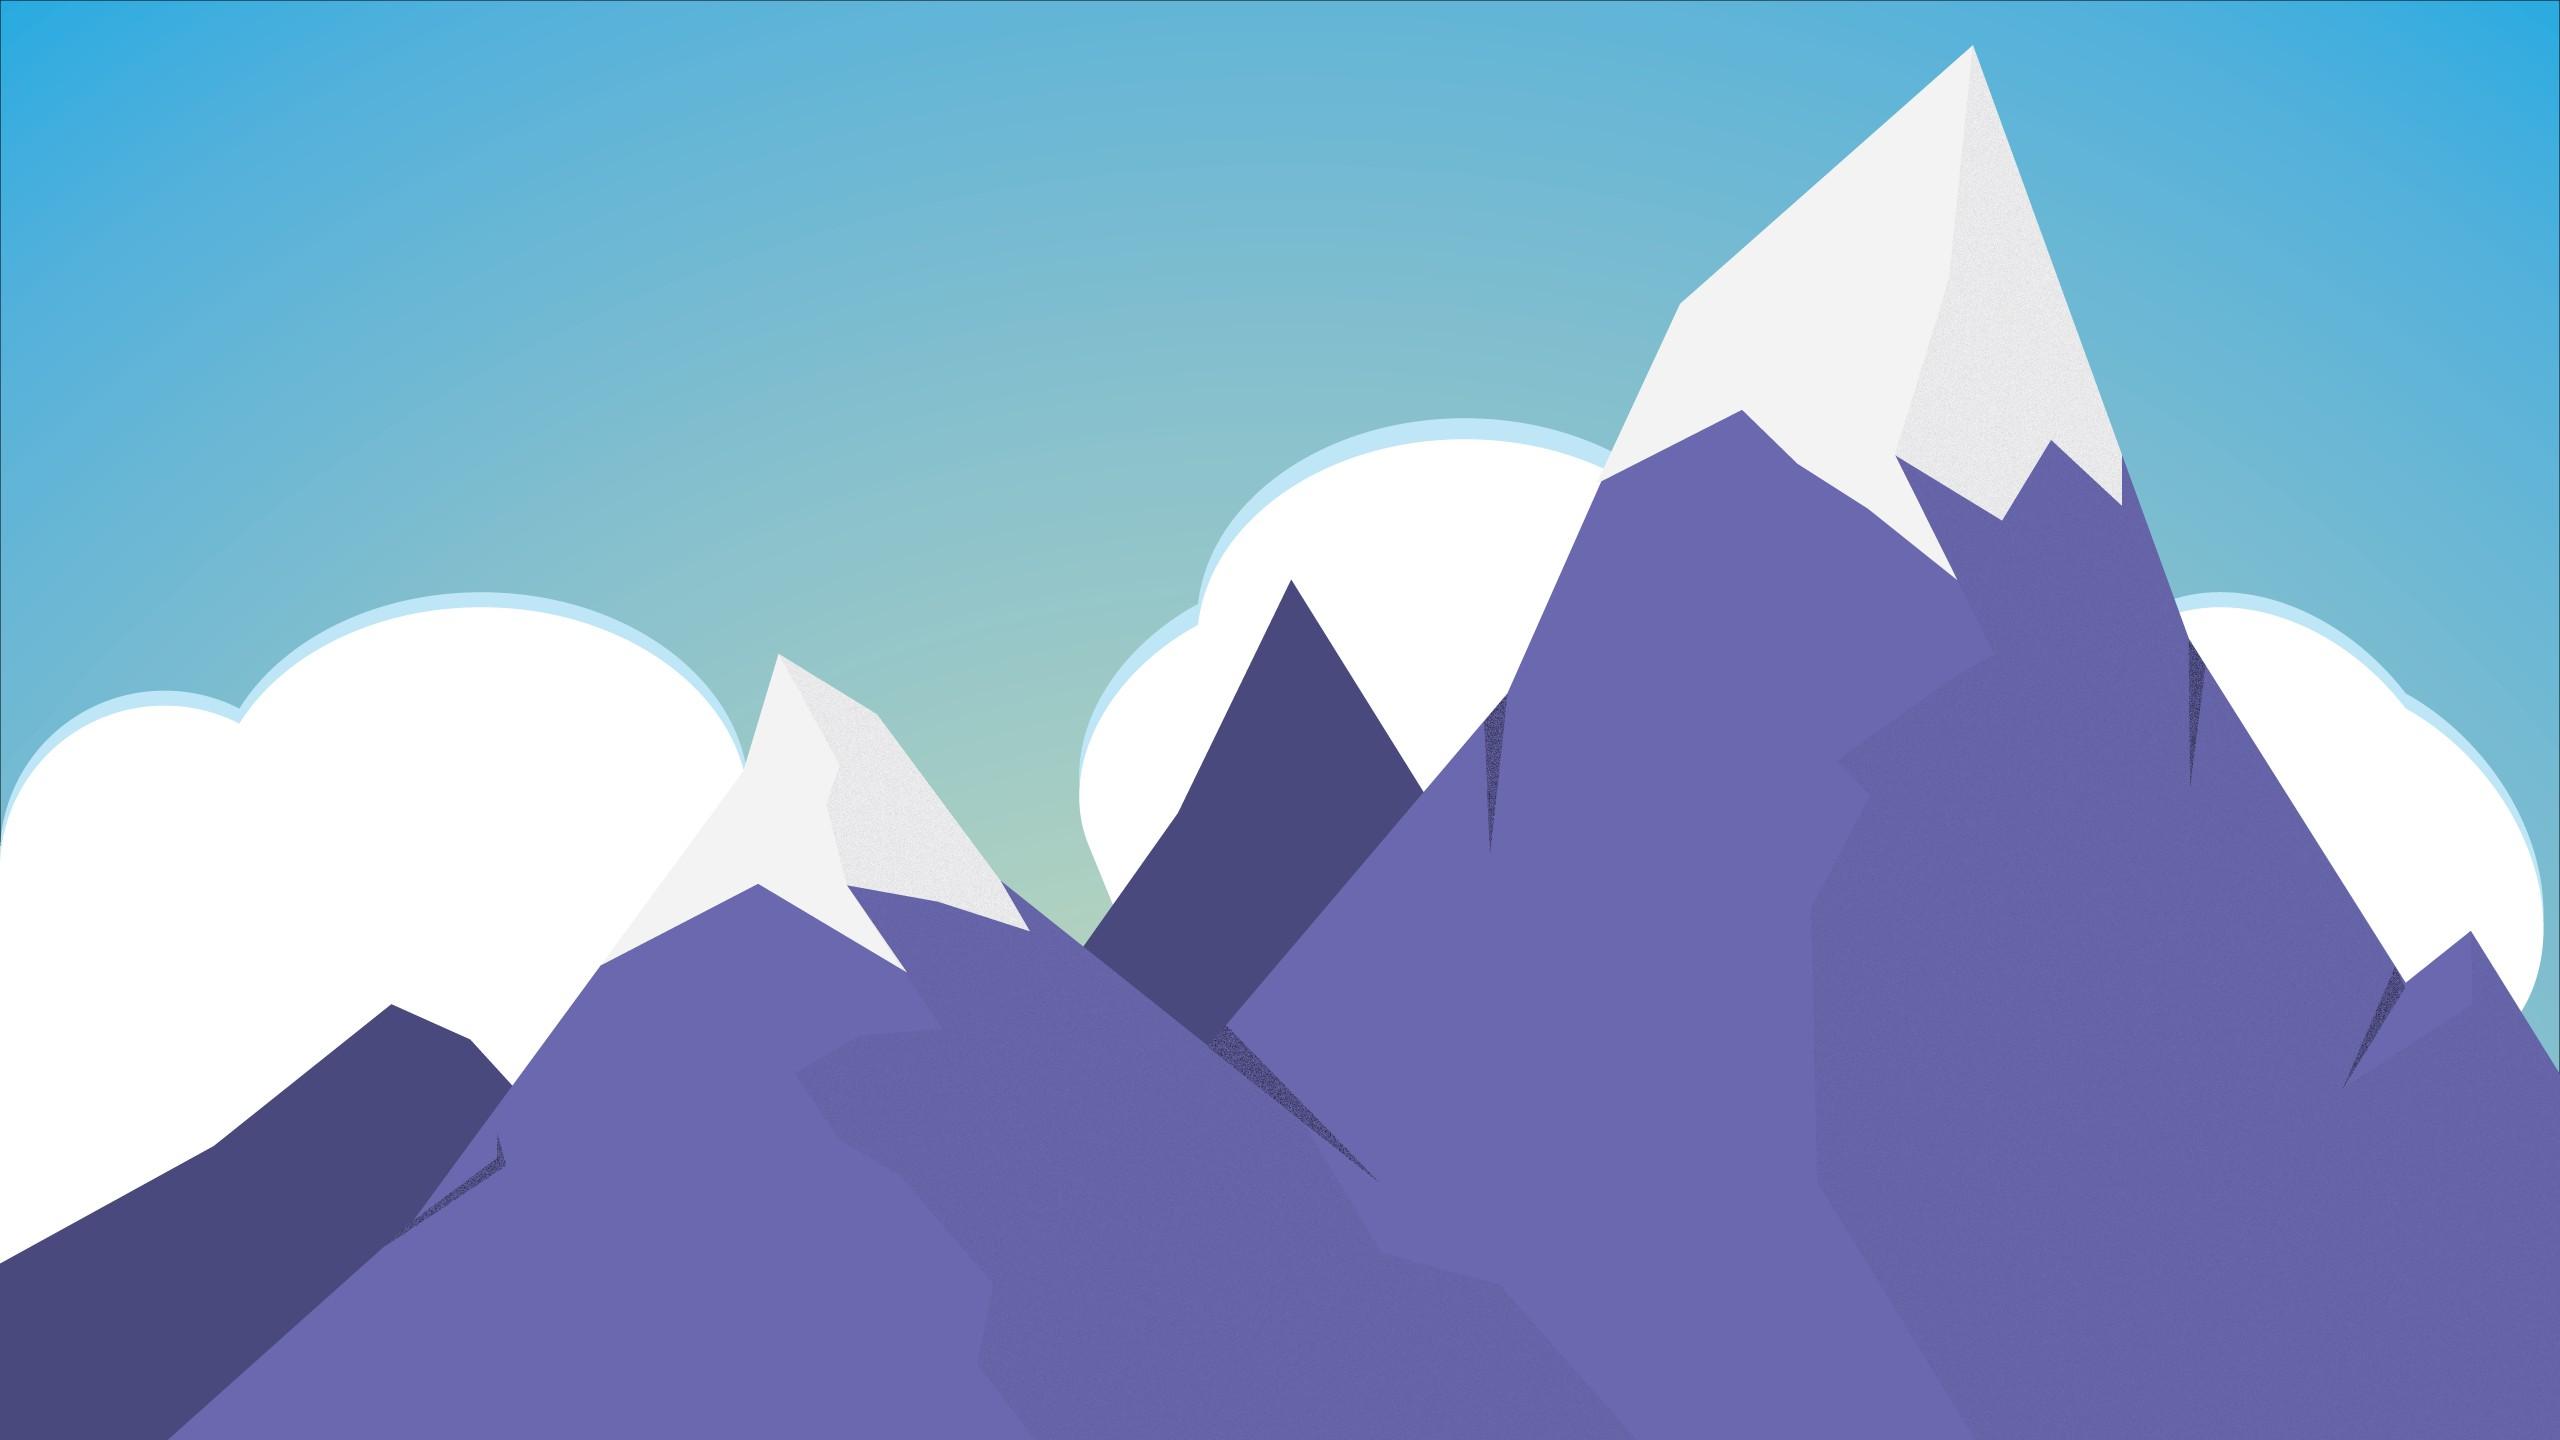 pin Mountain clipart mountain border #2 - Mountain Peak PNG HD